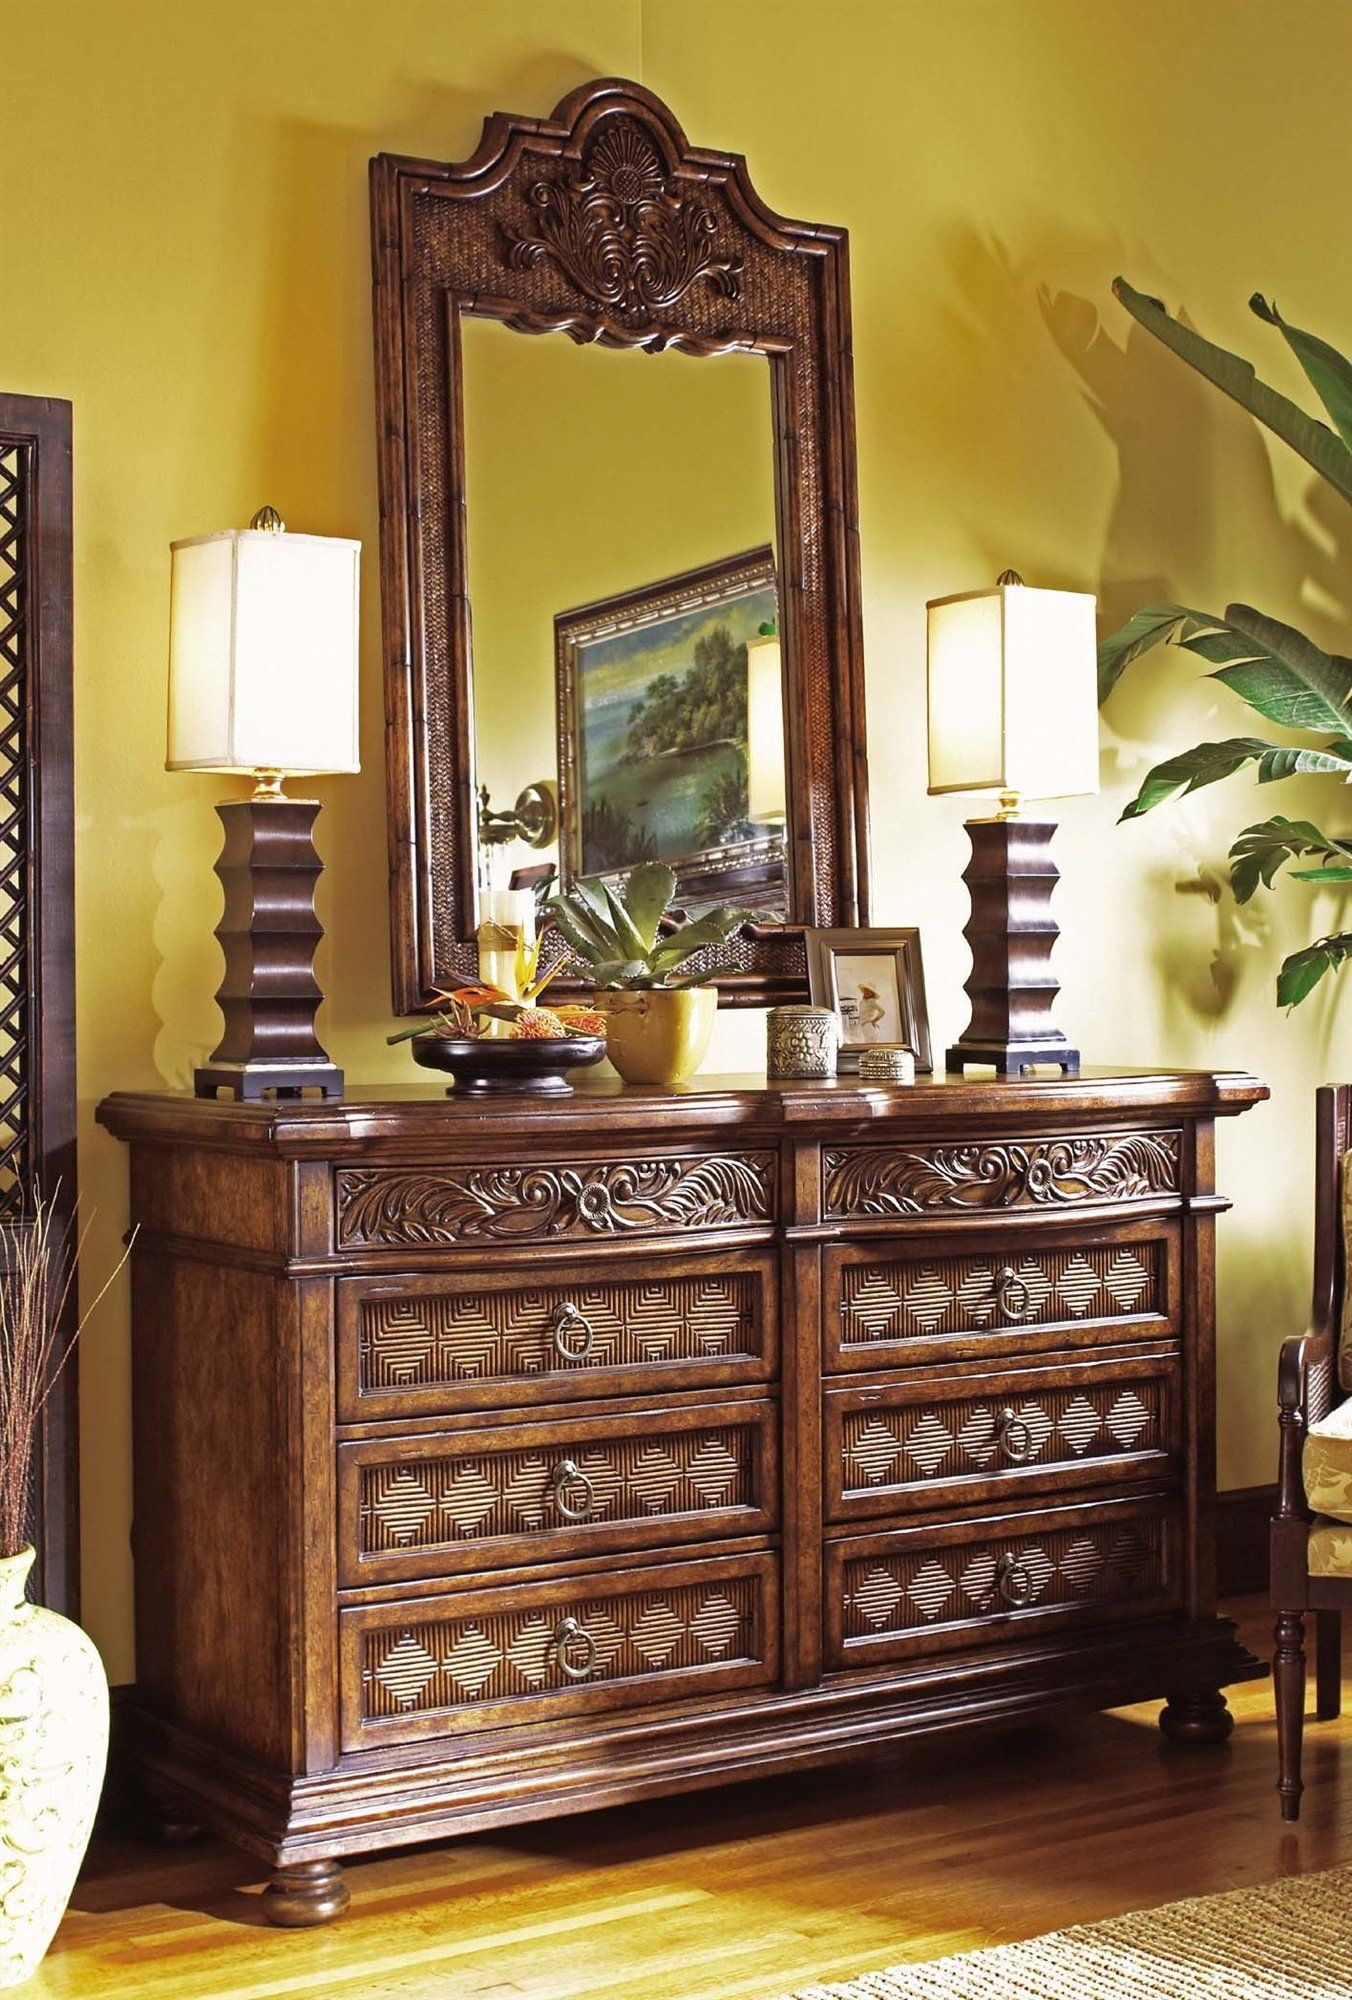 Tommy Bahama Bedroom Chest Cheap Jimbaran Bay Dresser Mirror Interiors